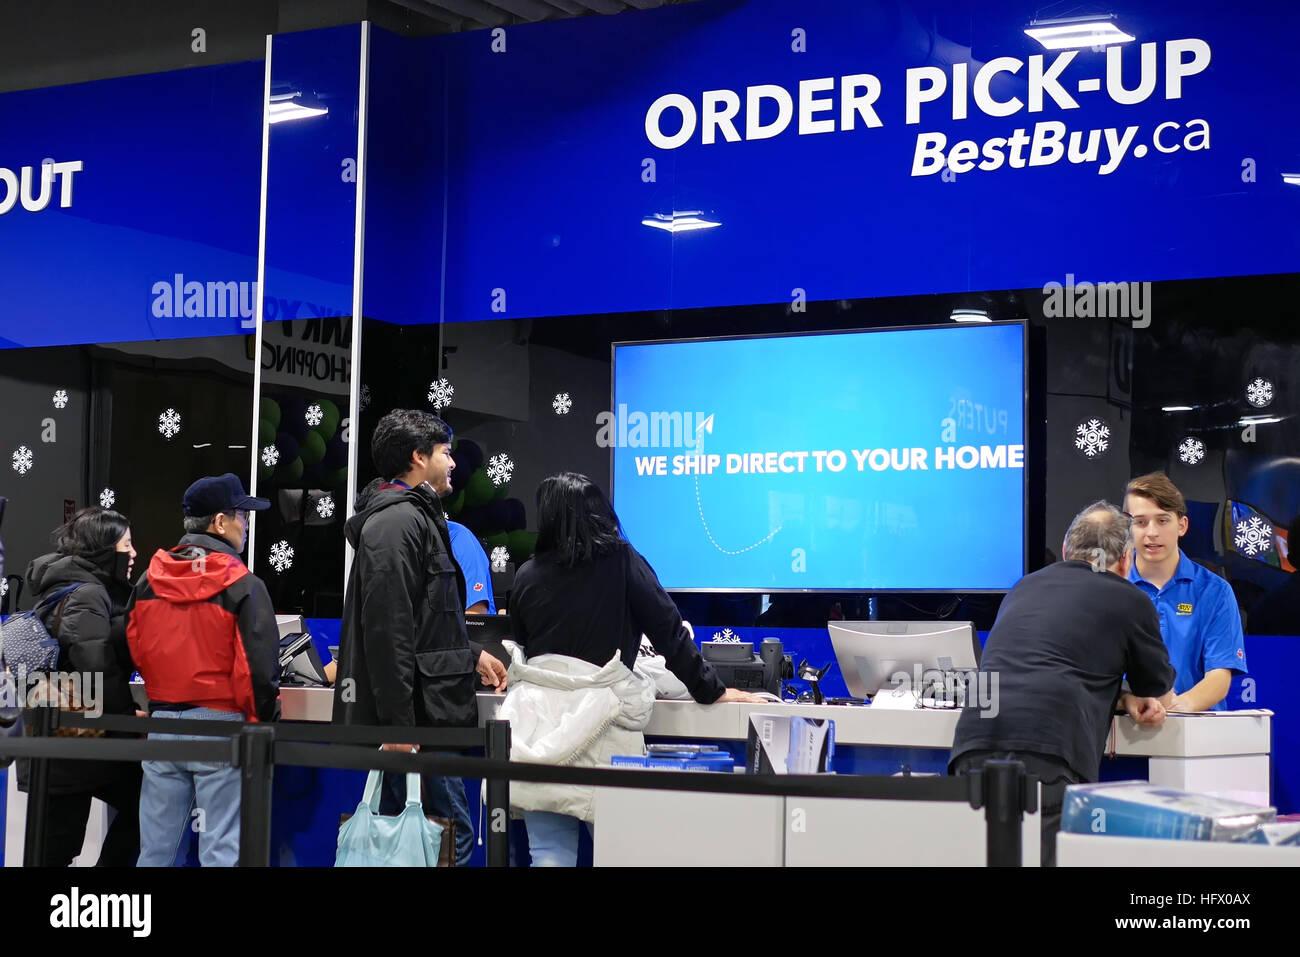 Best Buy Interior Store Stock Photos & Best Buy Interior Store Stock ...